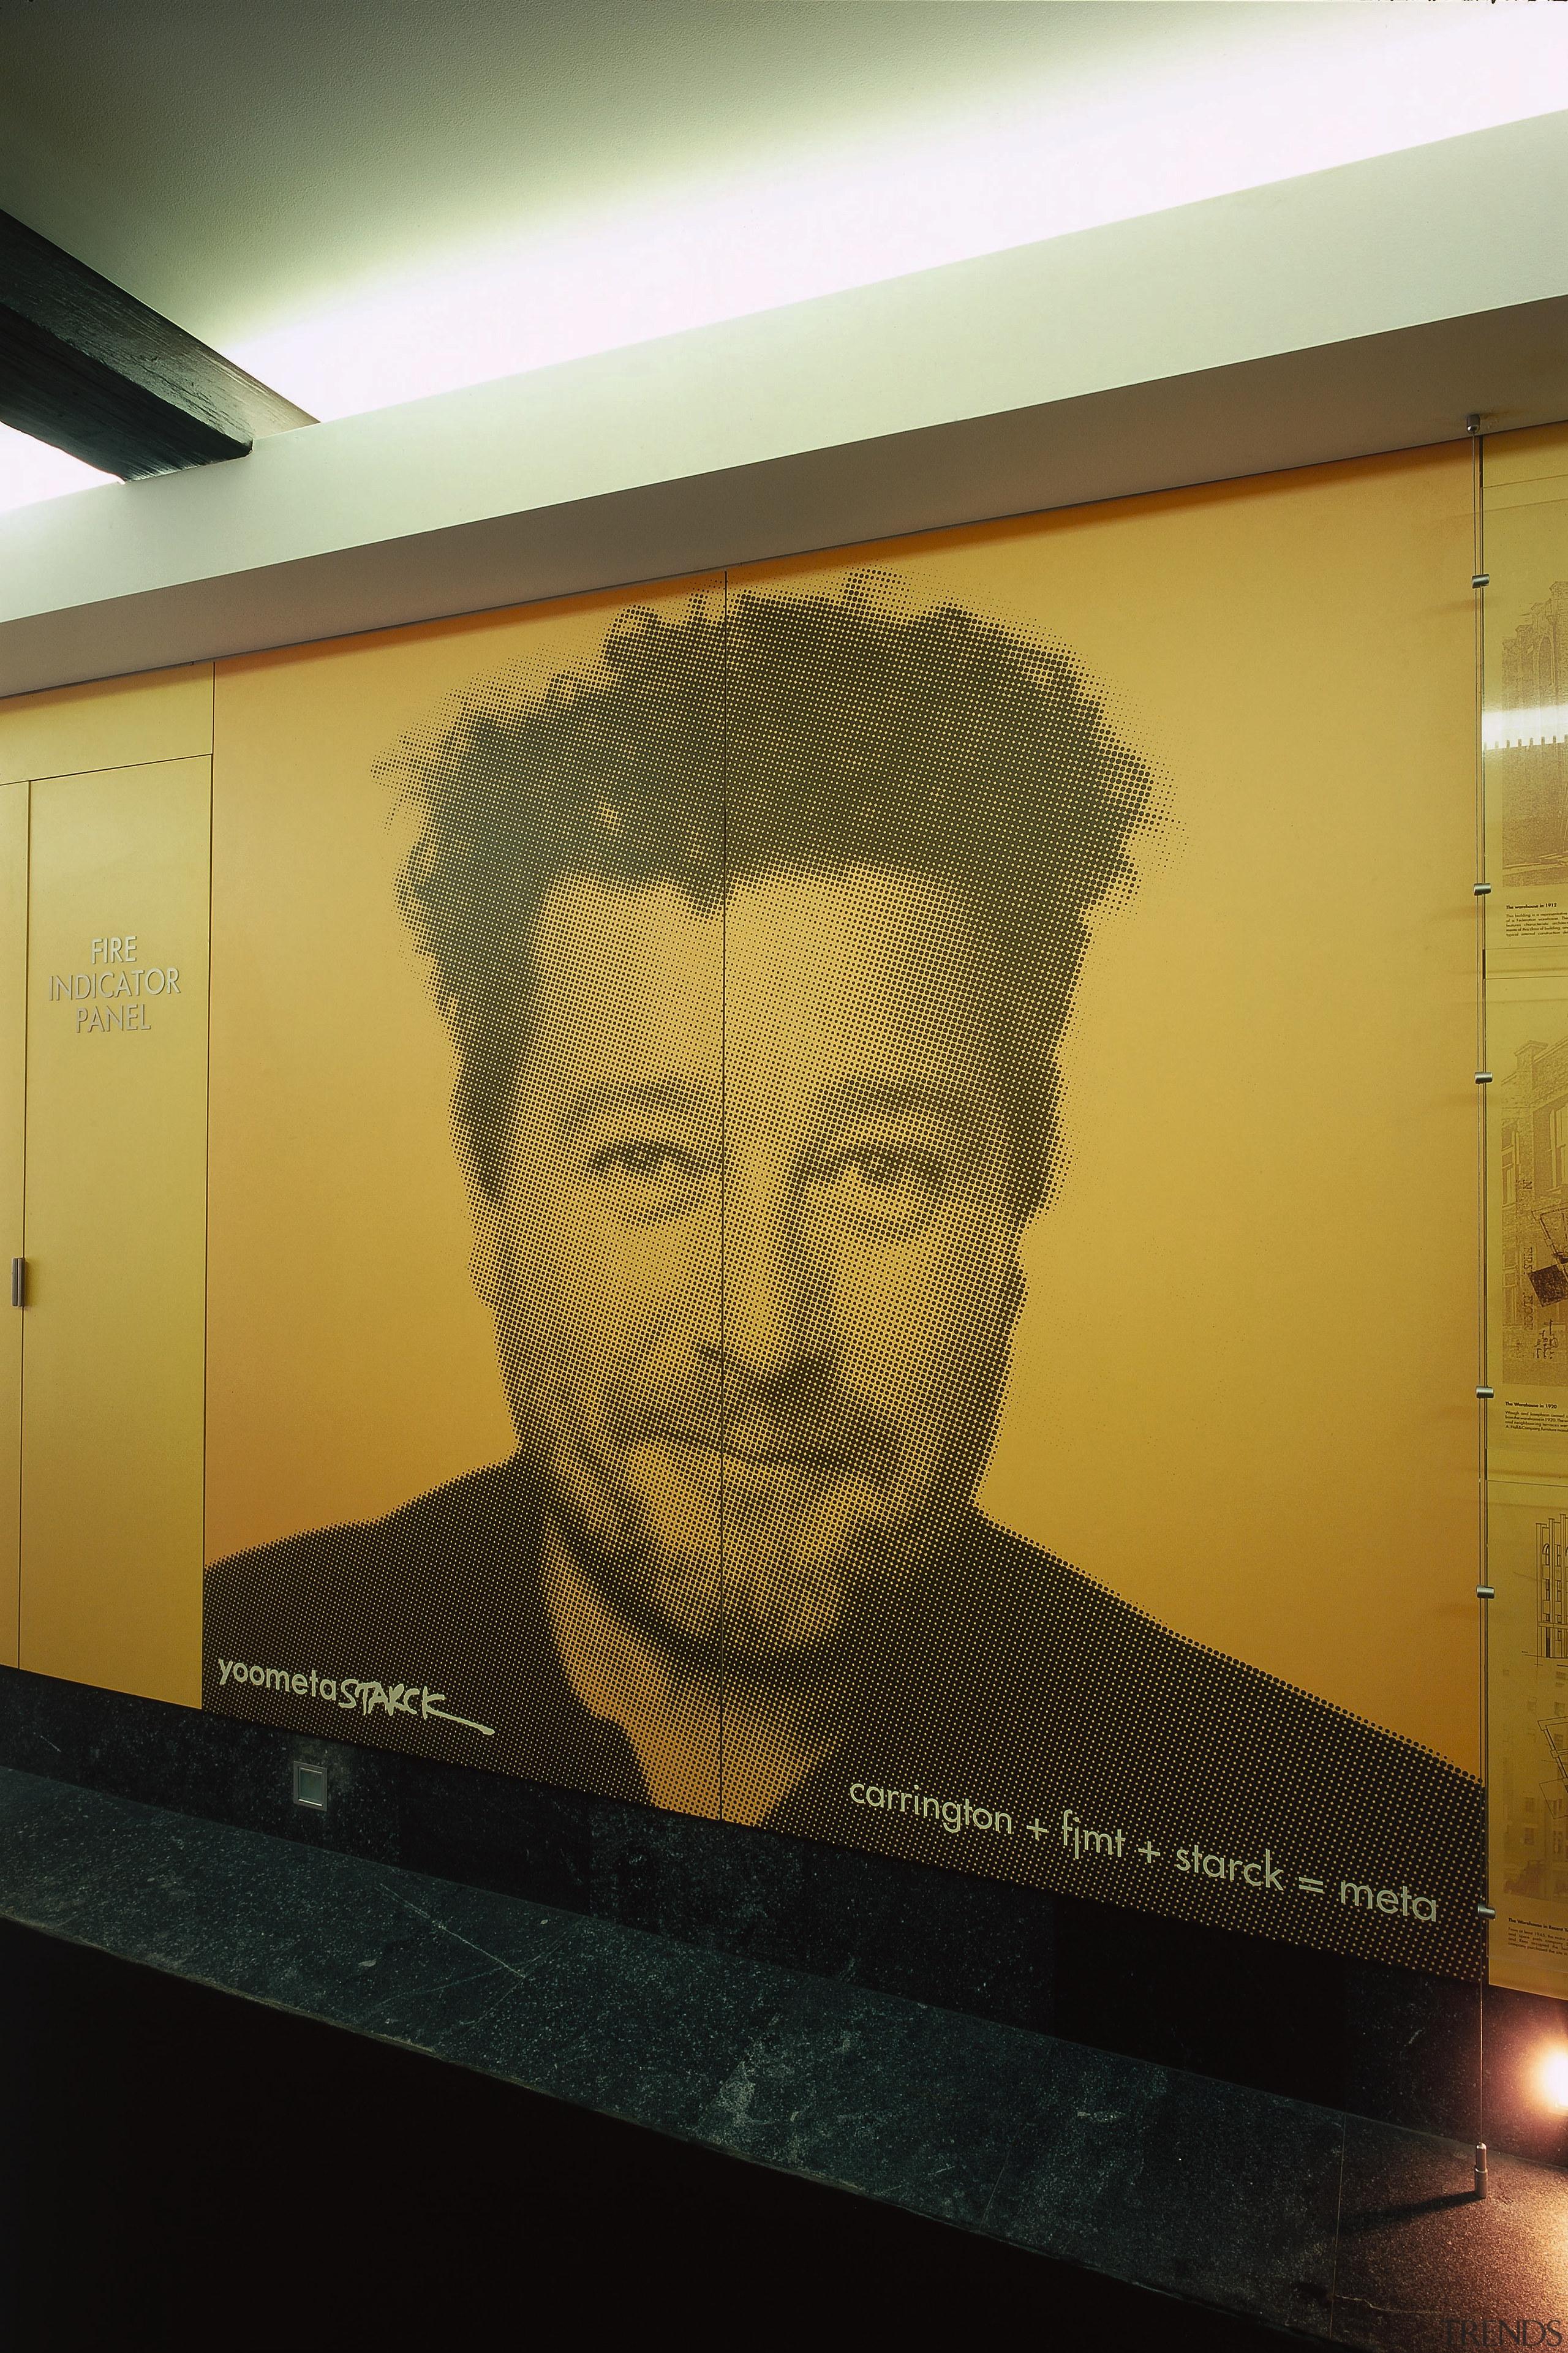 view of the fusion laminate wall surface - art, design, facial hair, snapshot, wall, yellow, brown, orange